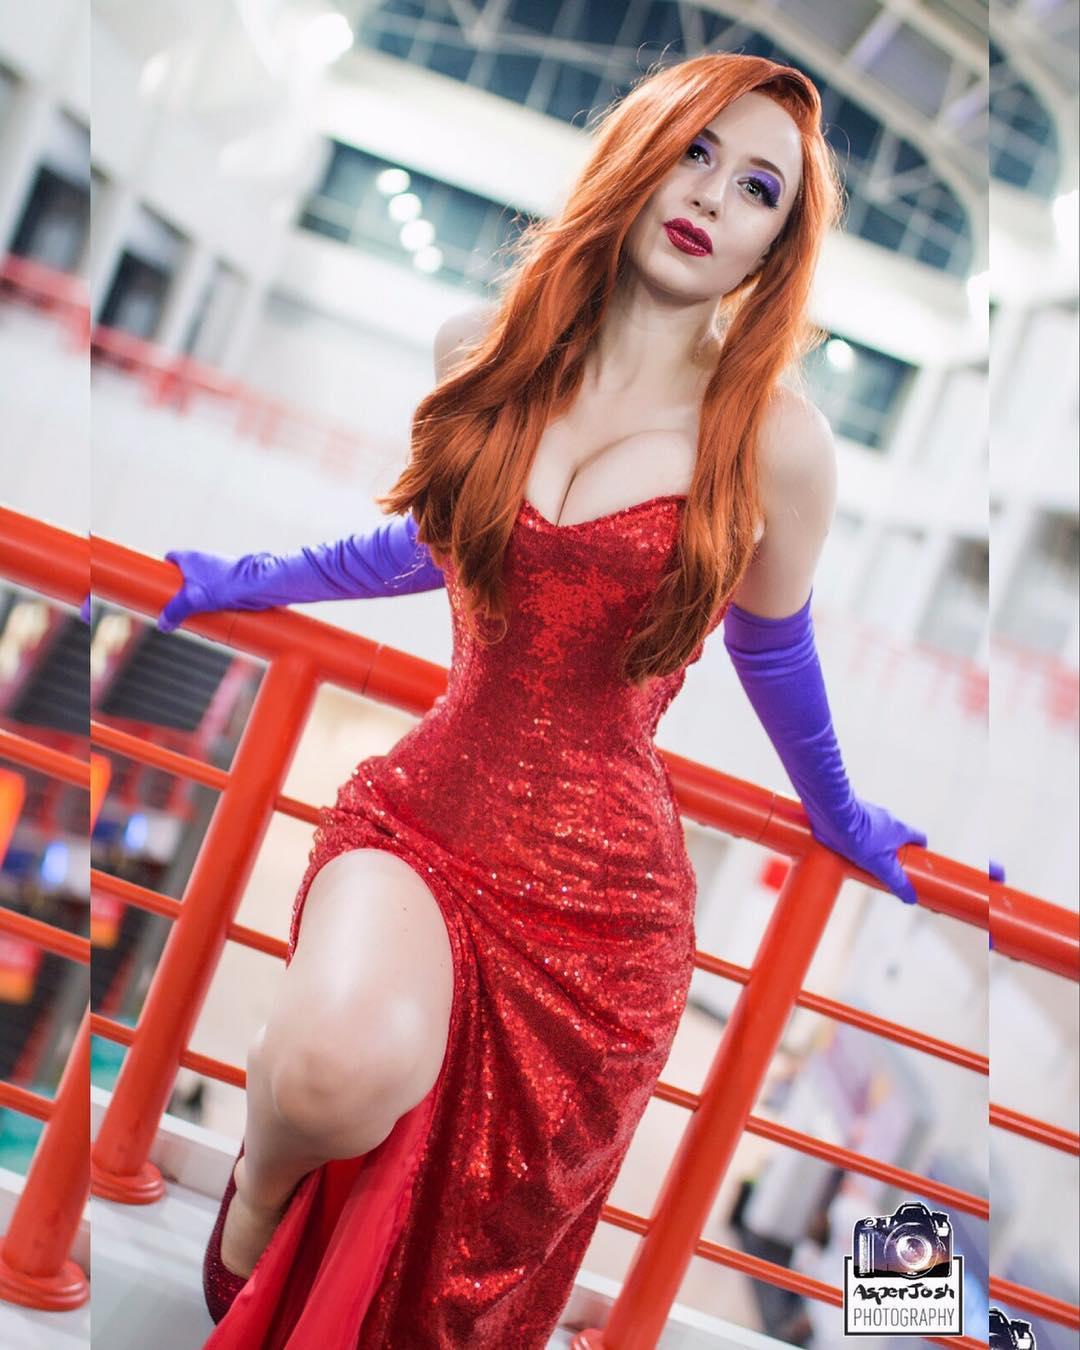 Jessica Rabbit Cosplay By DropDeadJokerCosplay